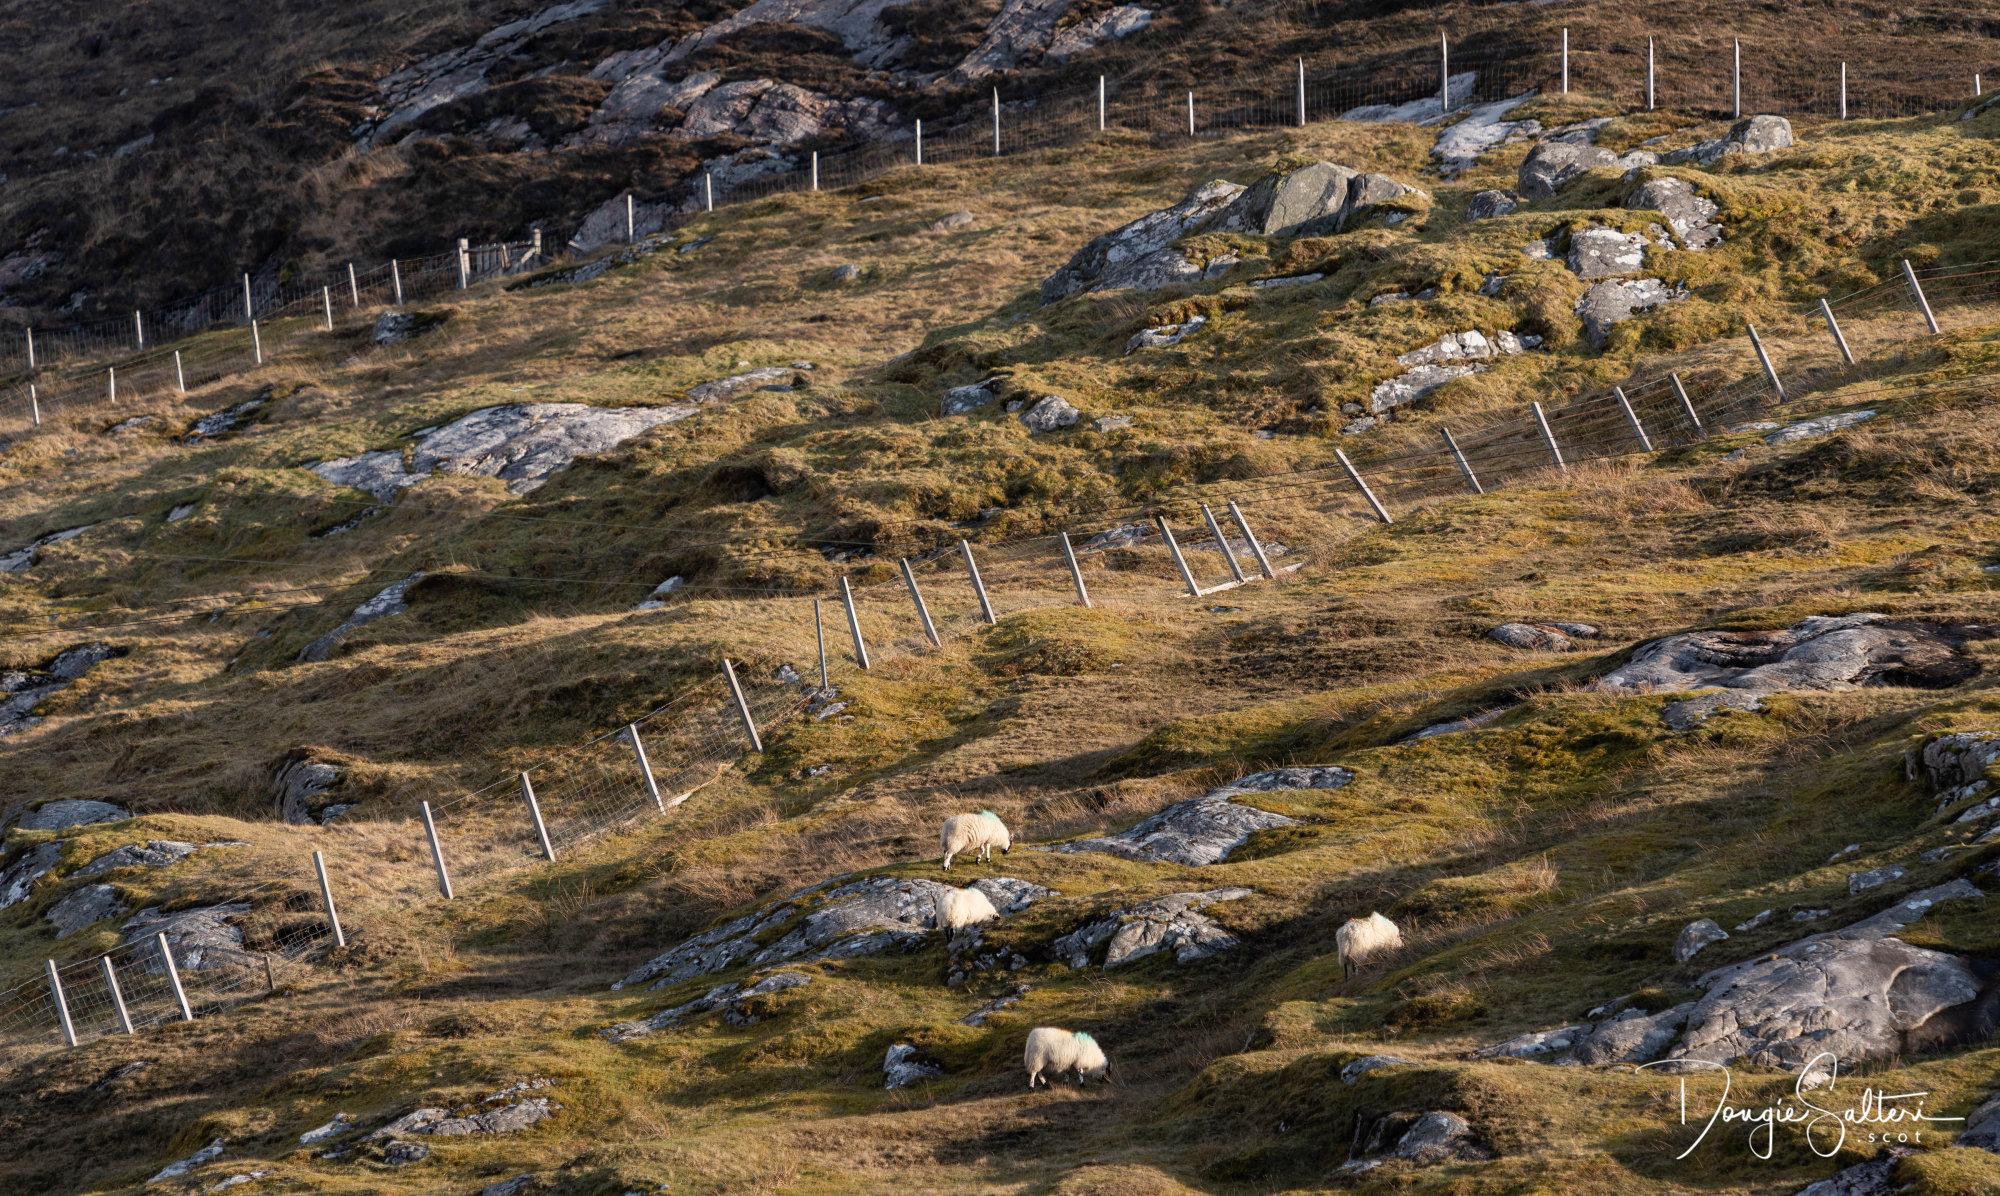 Fences and Sheep...